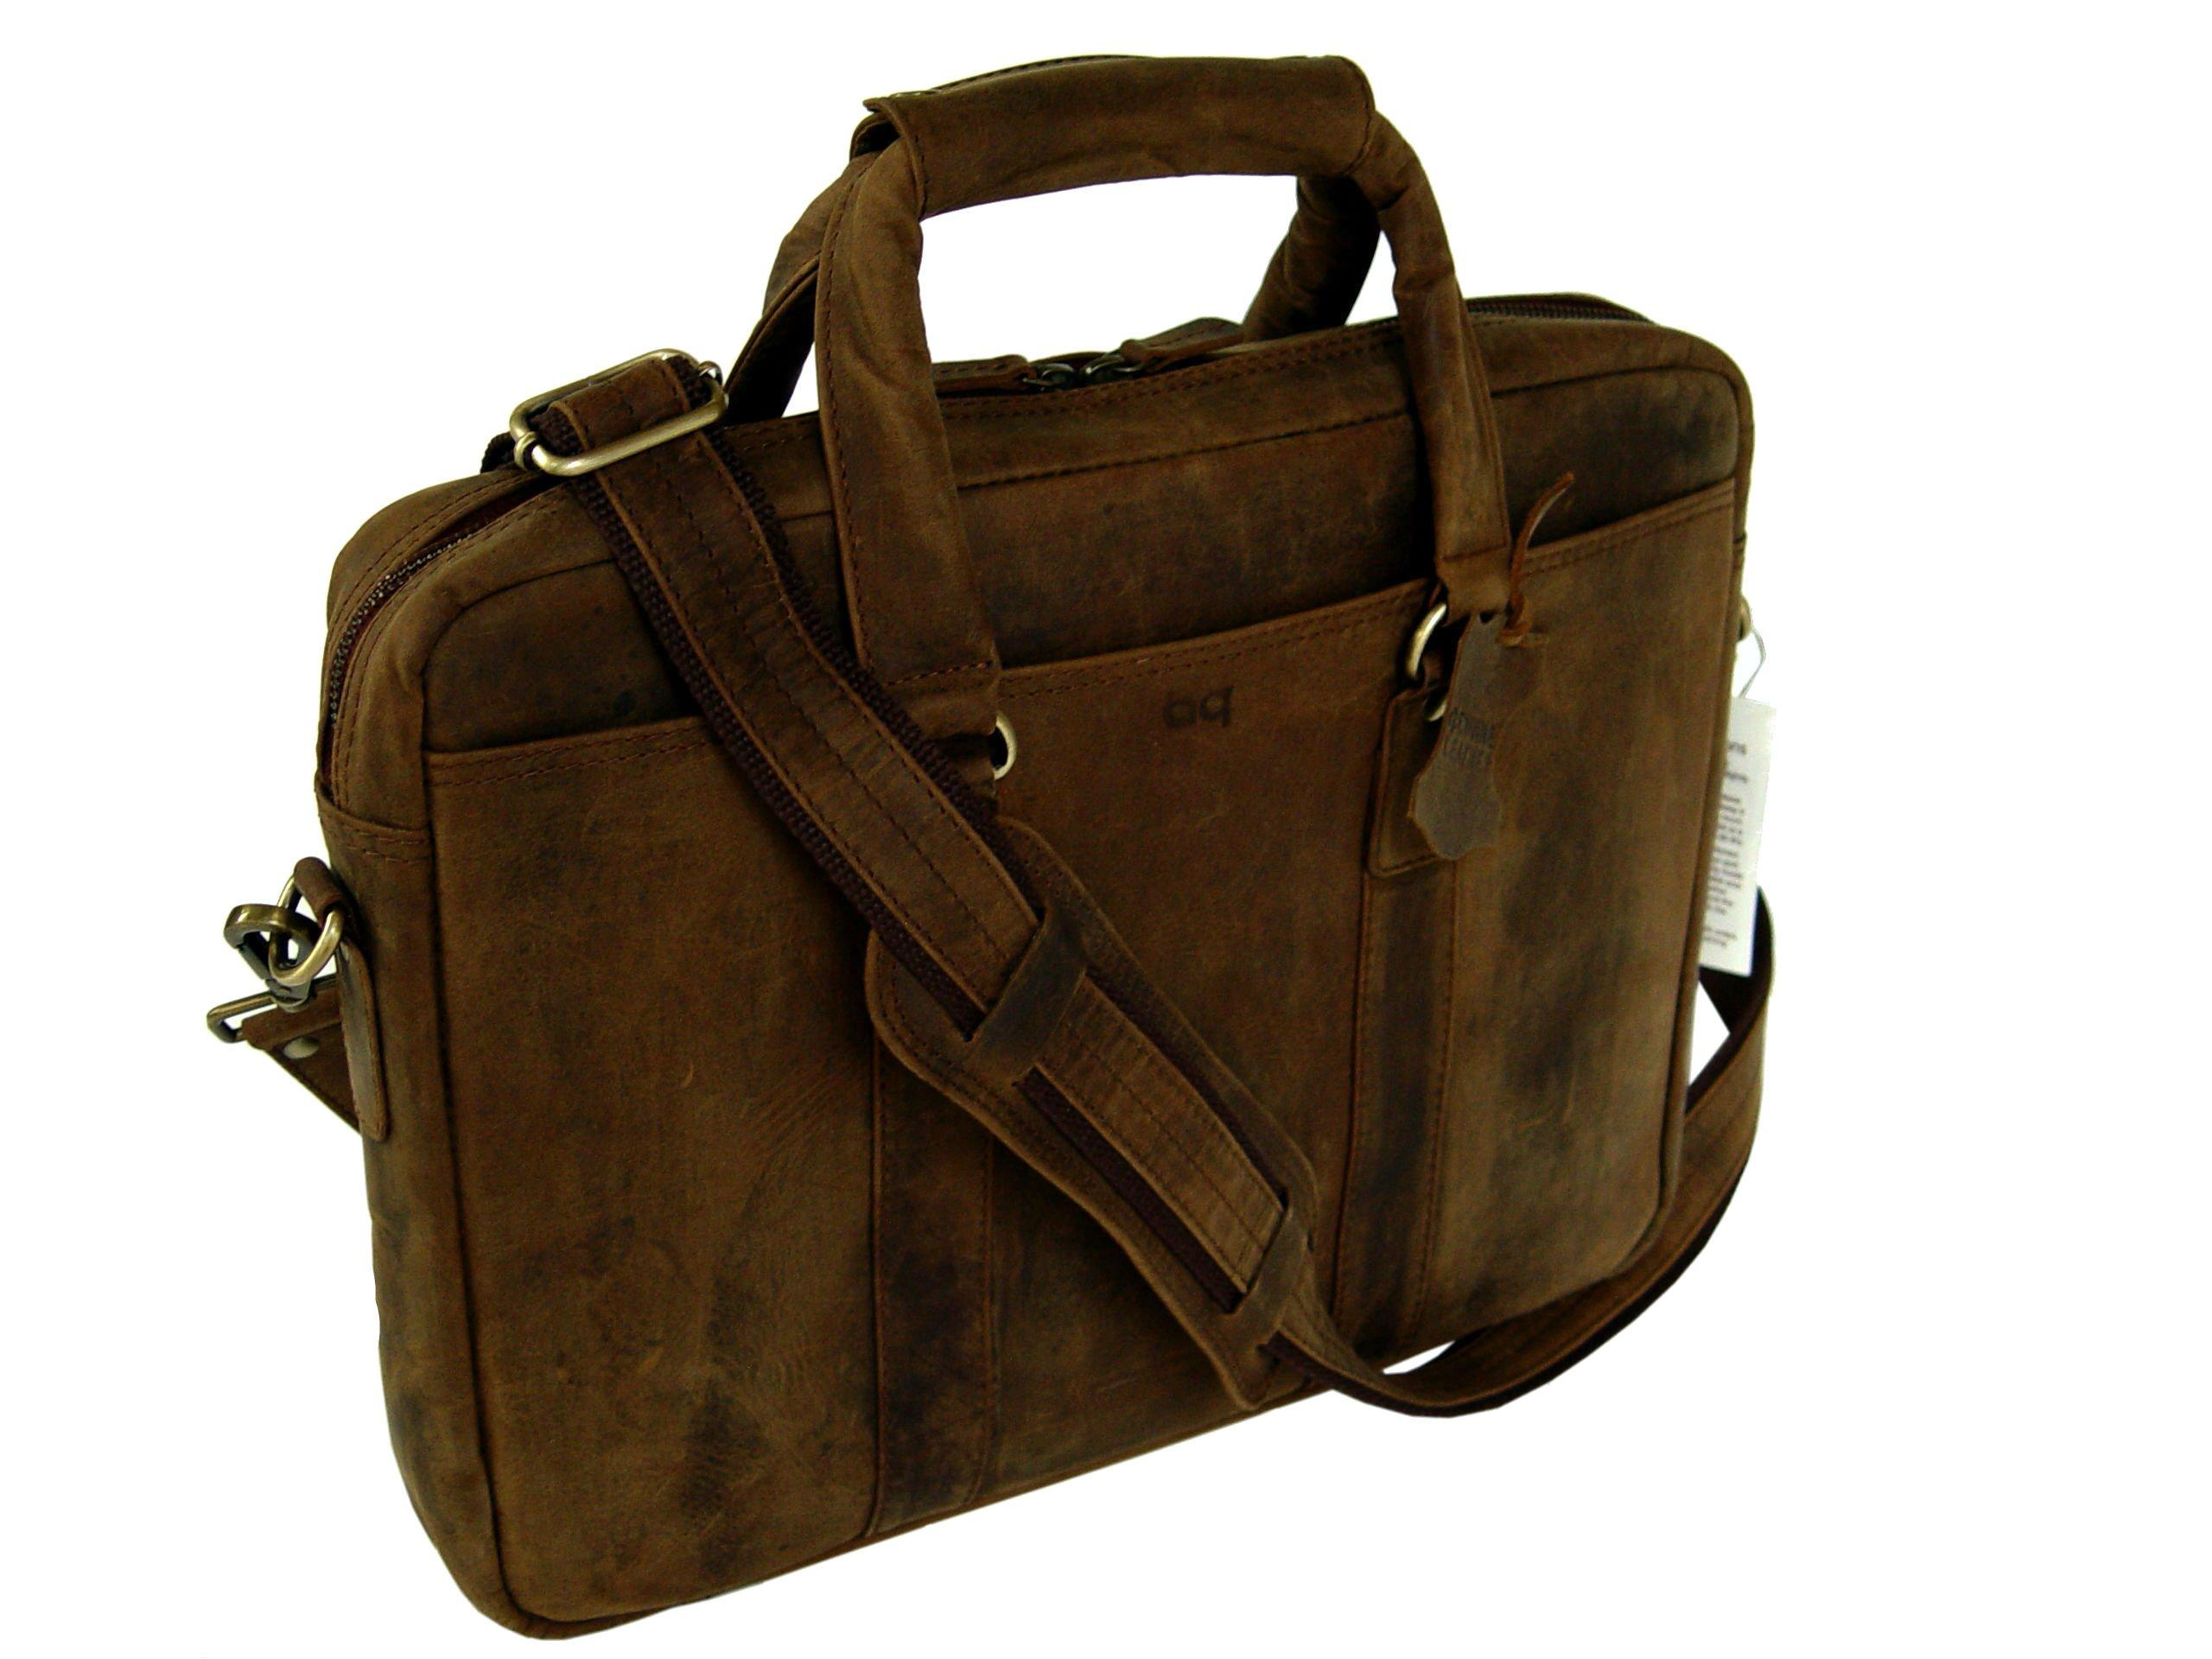 BASIC GEAR Full Grain Leather Messenger Bag Laptop Briefcase in Vintage Rustic look